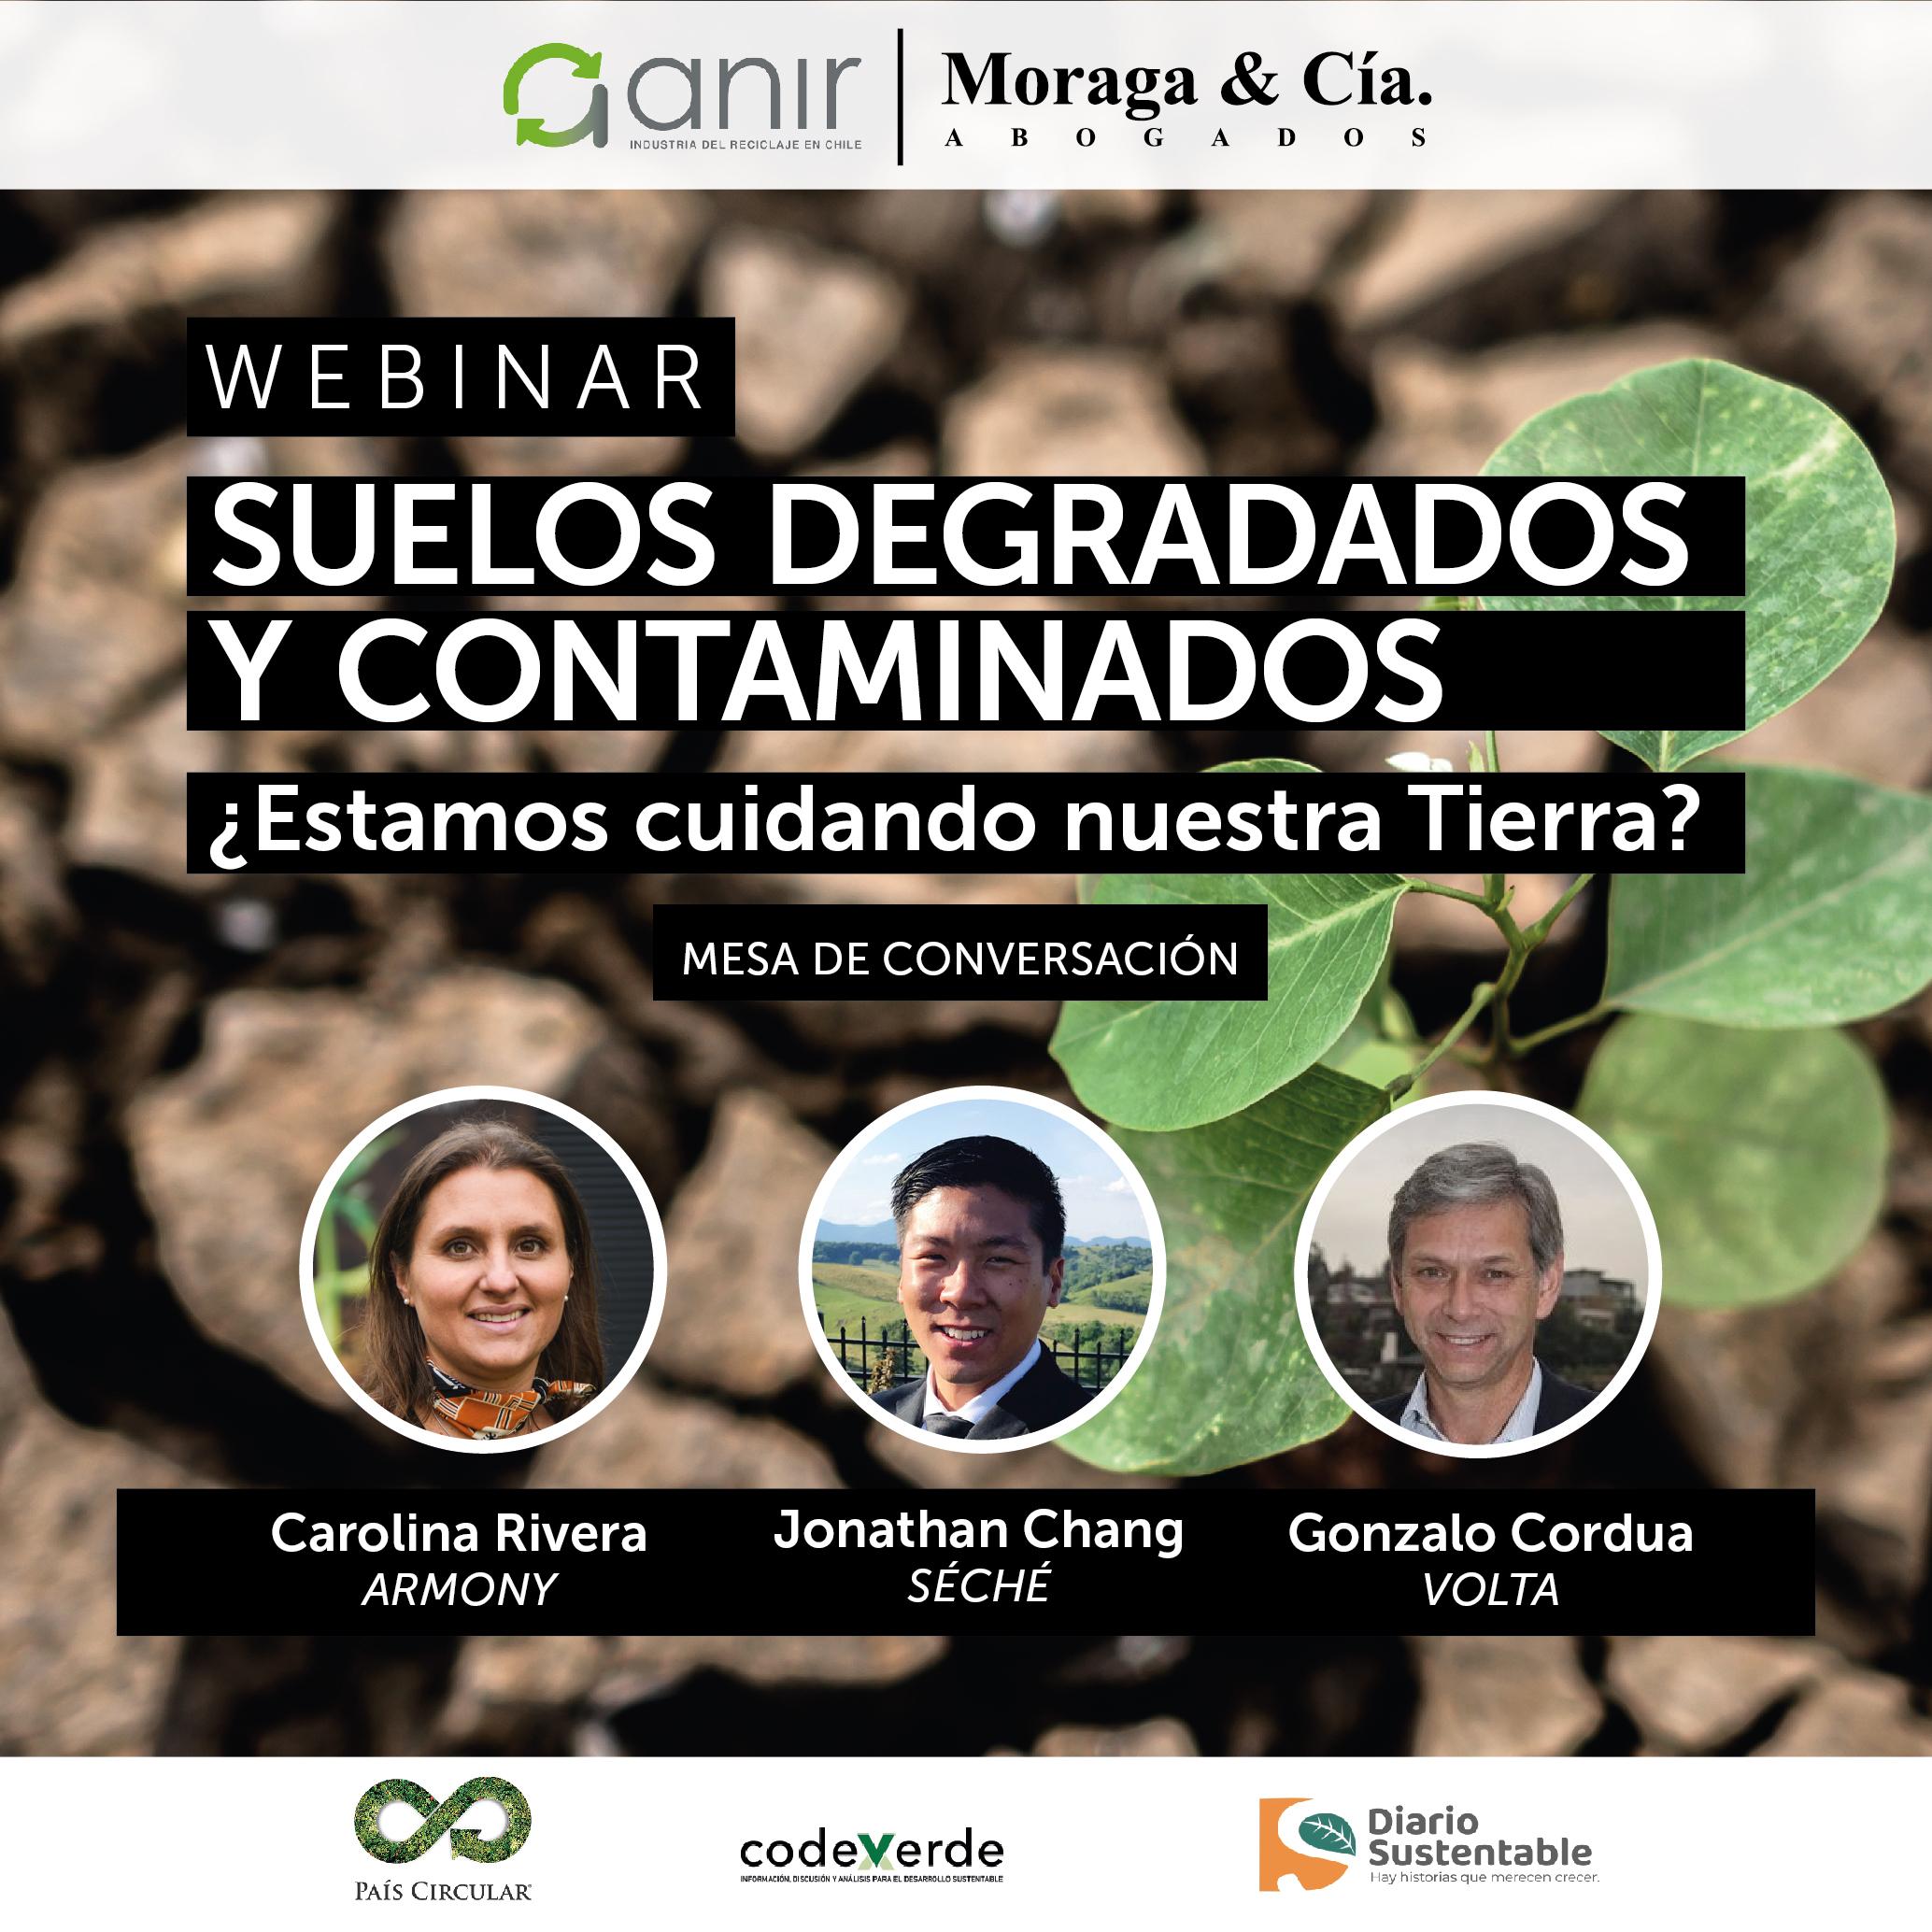 Webinar participacion Seche Group Chile